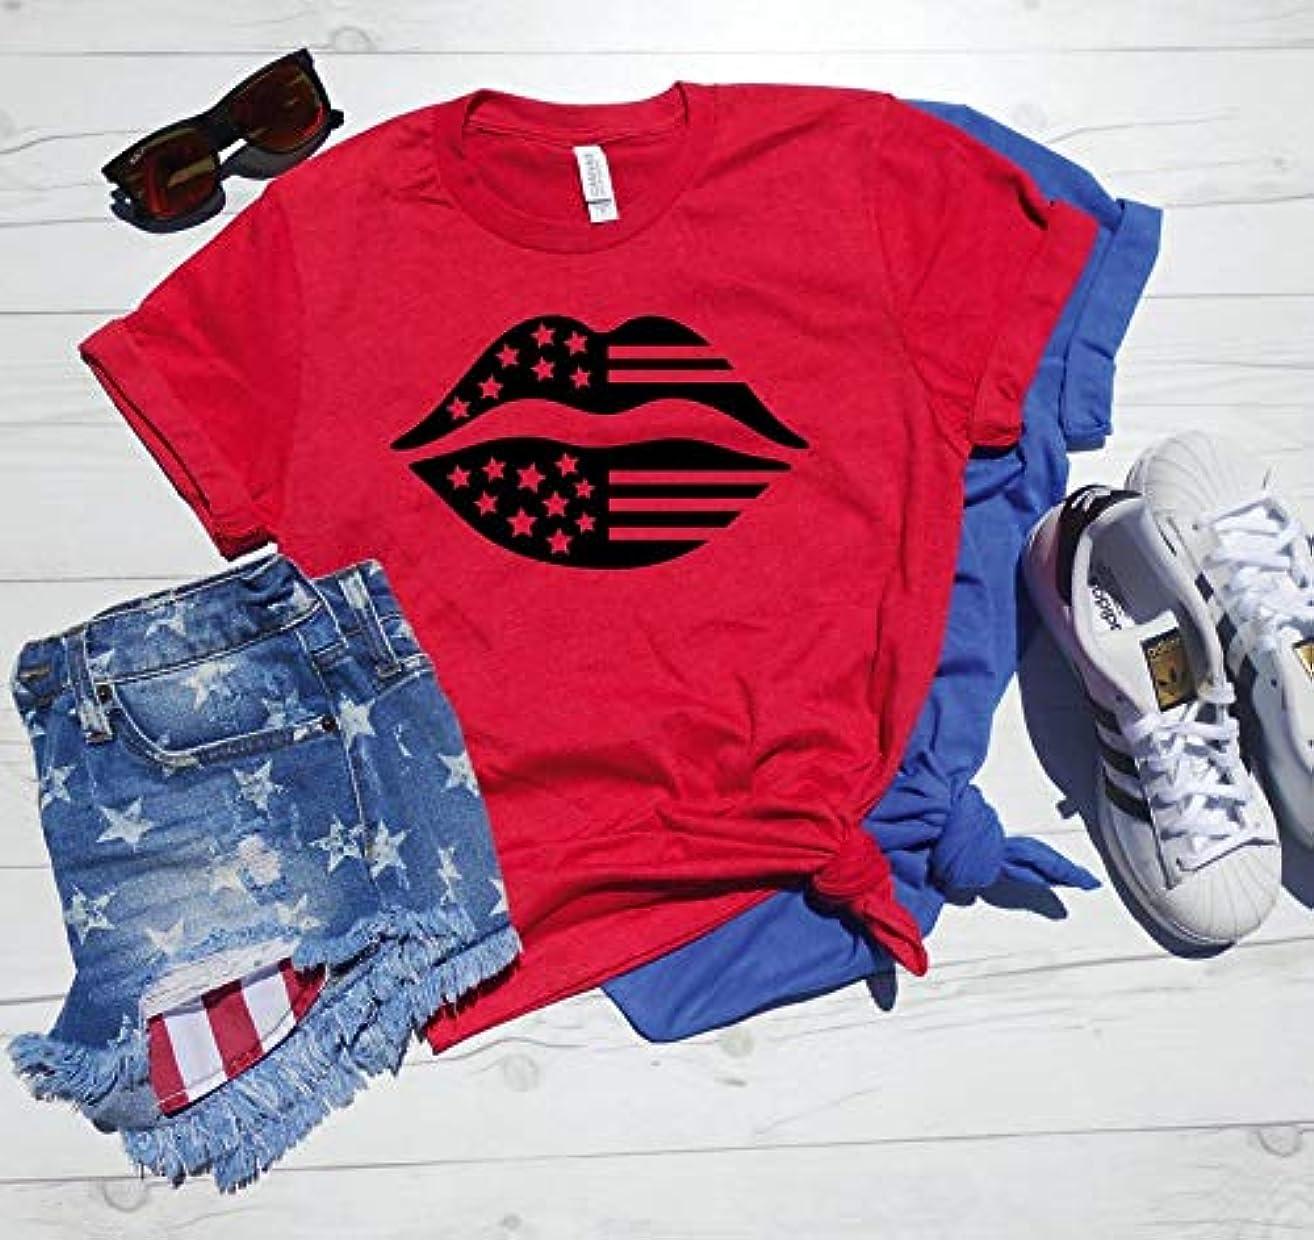 American Flag Lips Shirt - Kiss Lips Stars Stripes Shirt - Cute 4th of July Shirt - 4th Of July Tee - July 4th Outfit - Drinking Shirt Lips